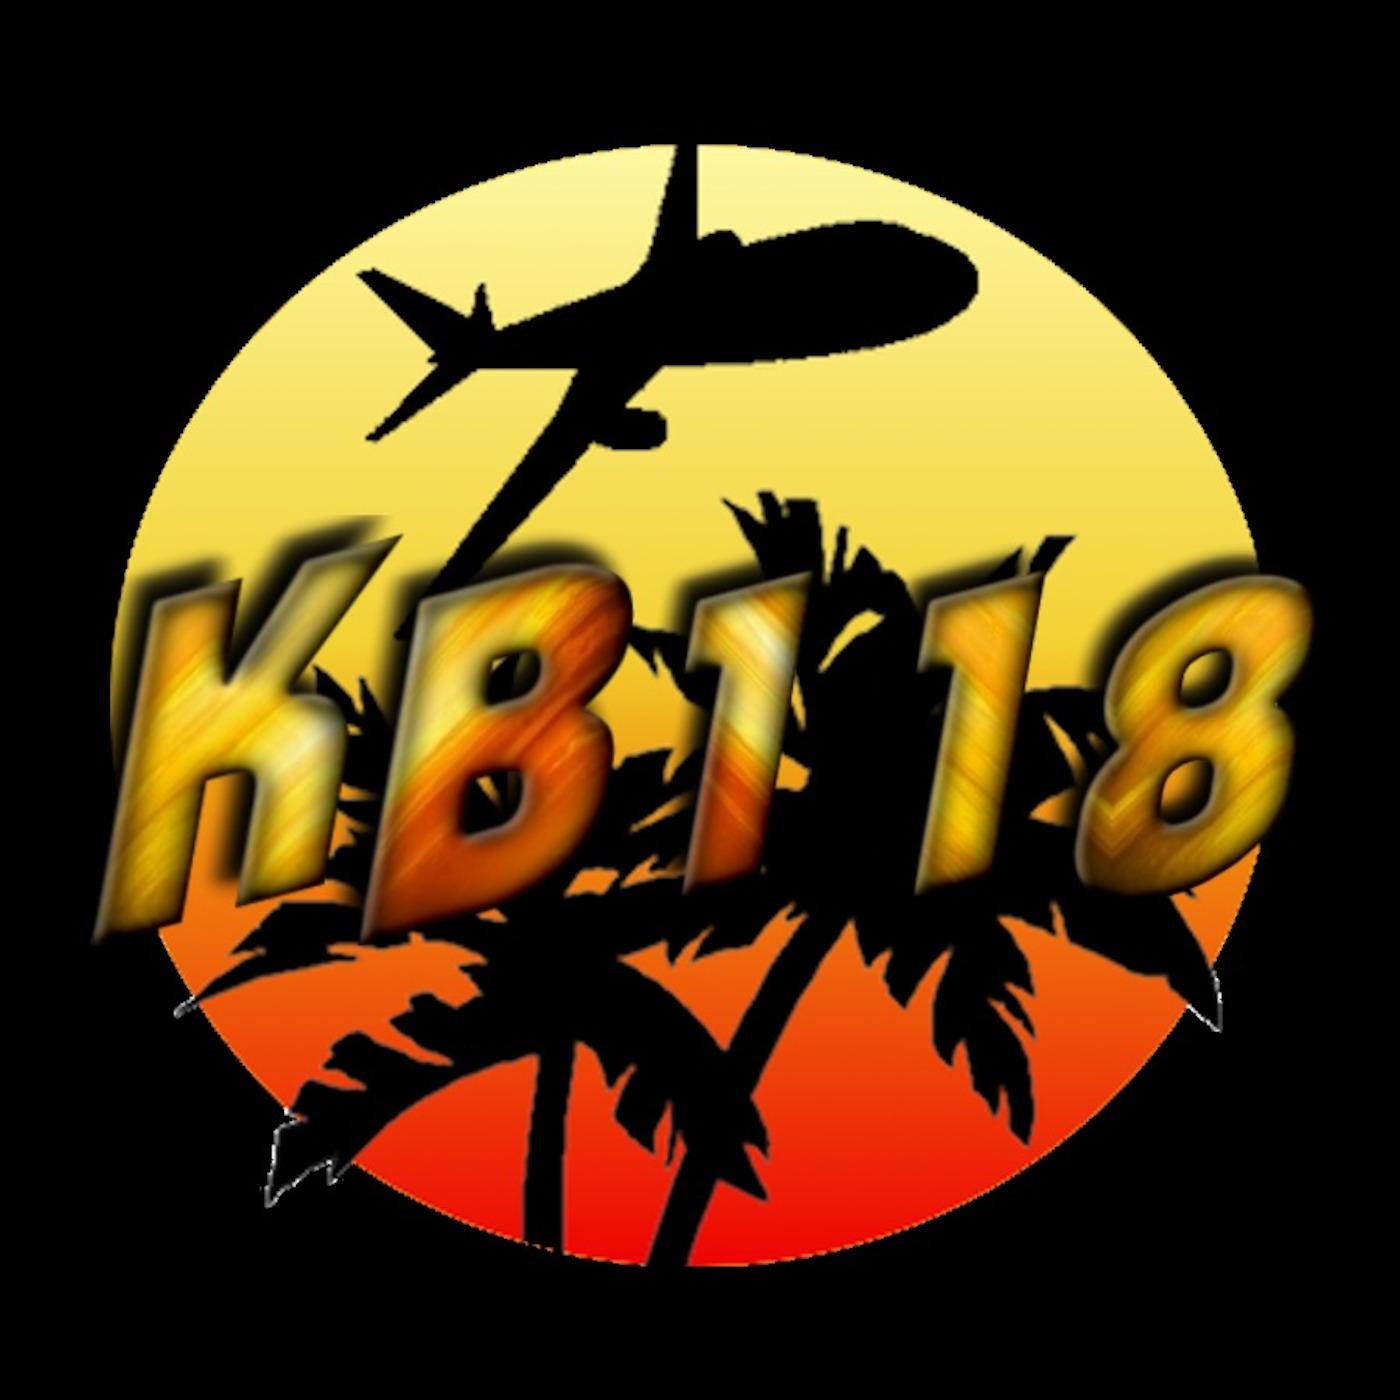 Kondo Beach 118Bpm